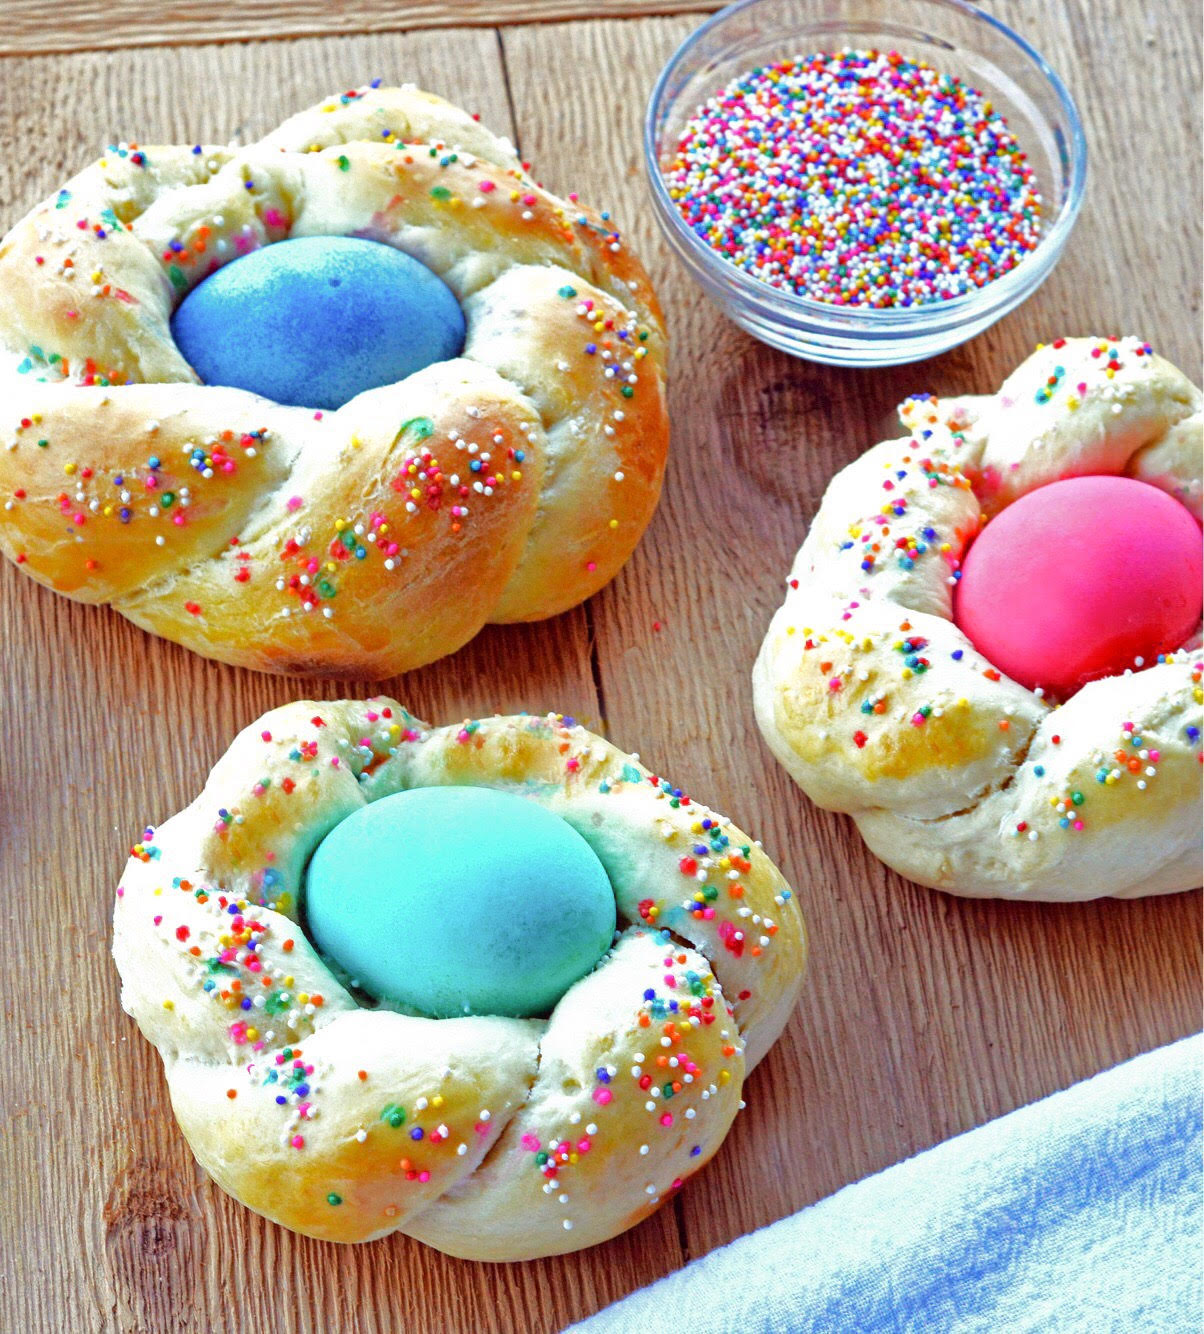 Italian Easter Egg Wreath Bread Recipe